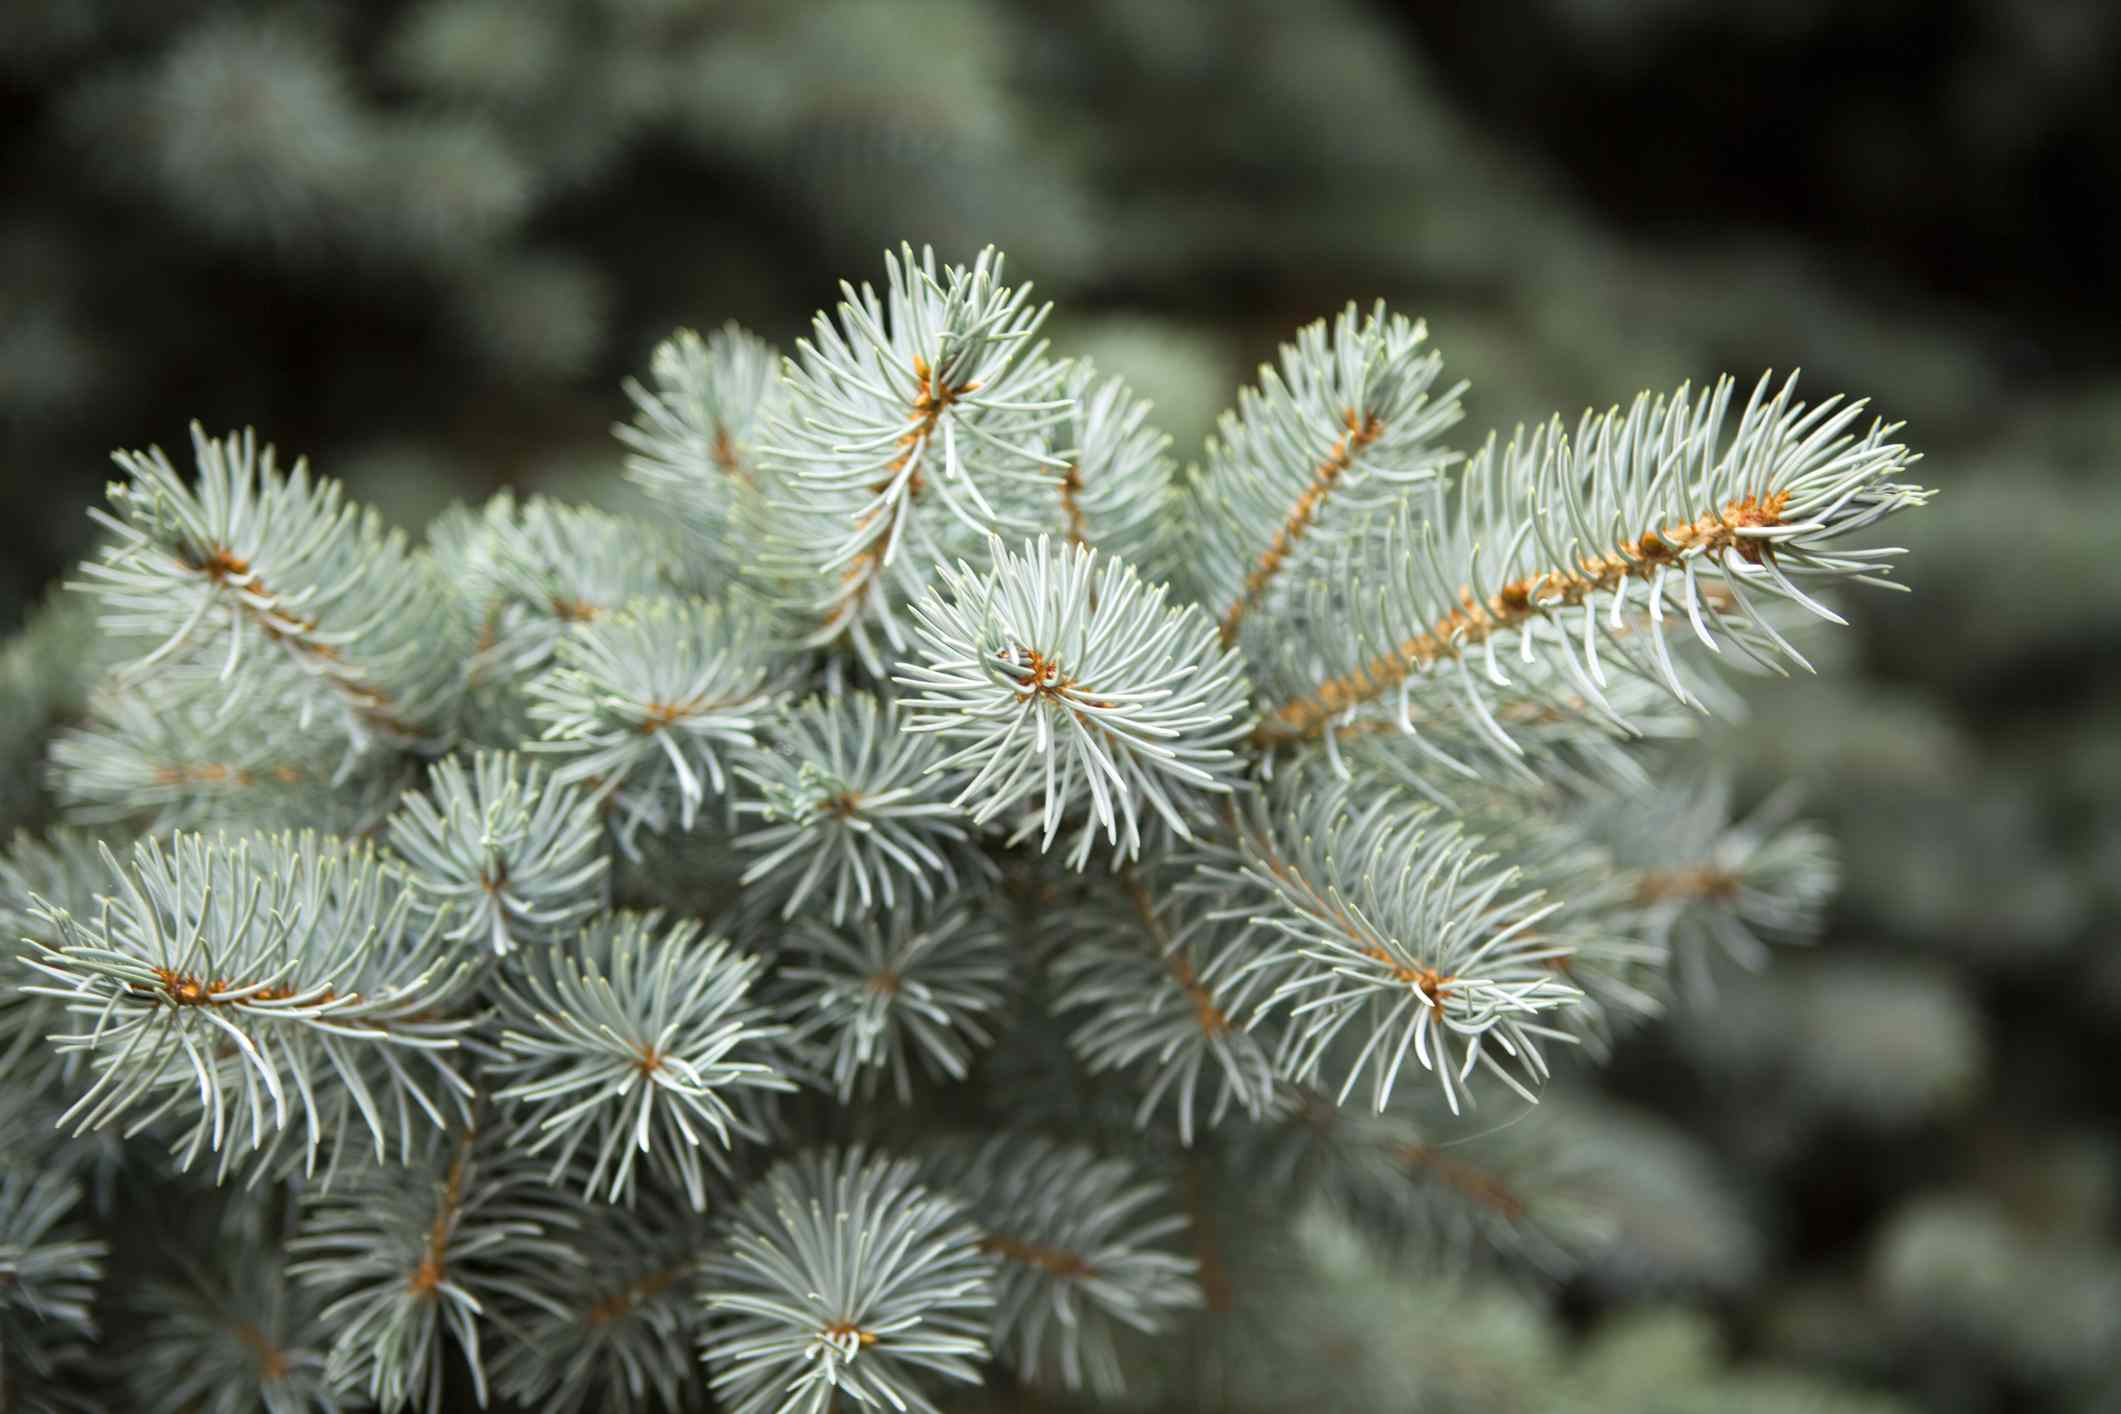 Detailed shot of white fir tree.